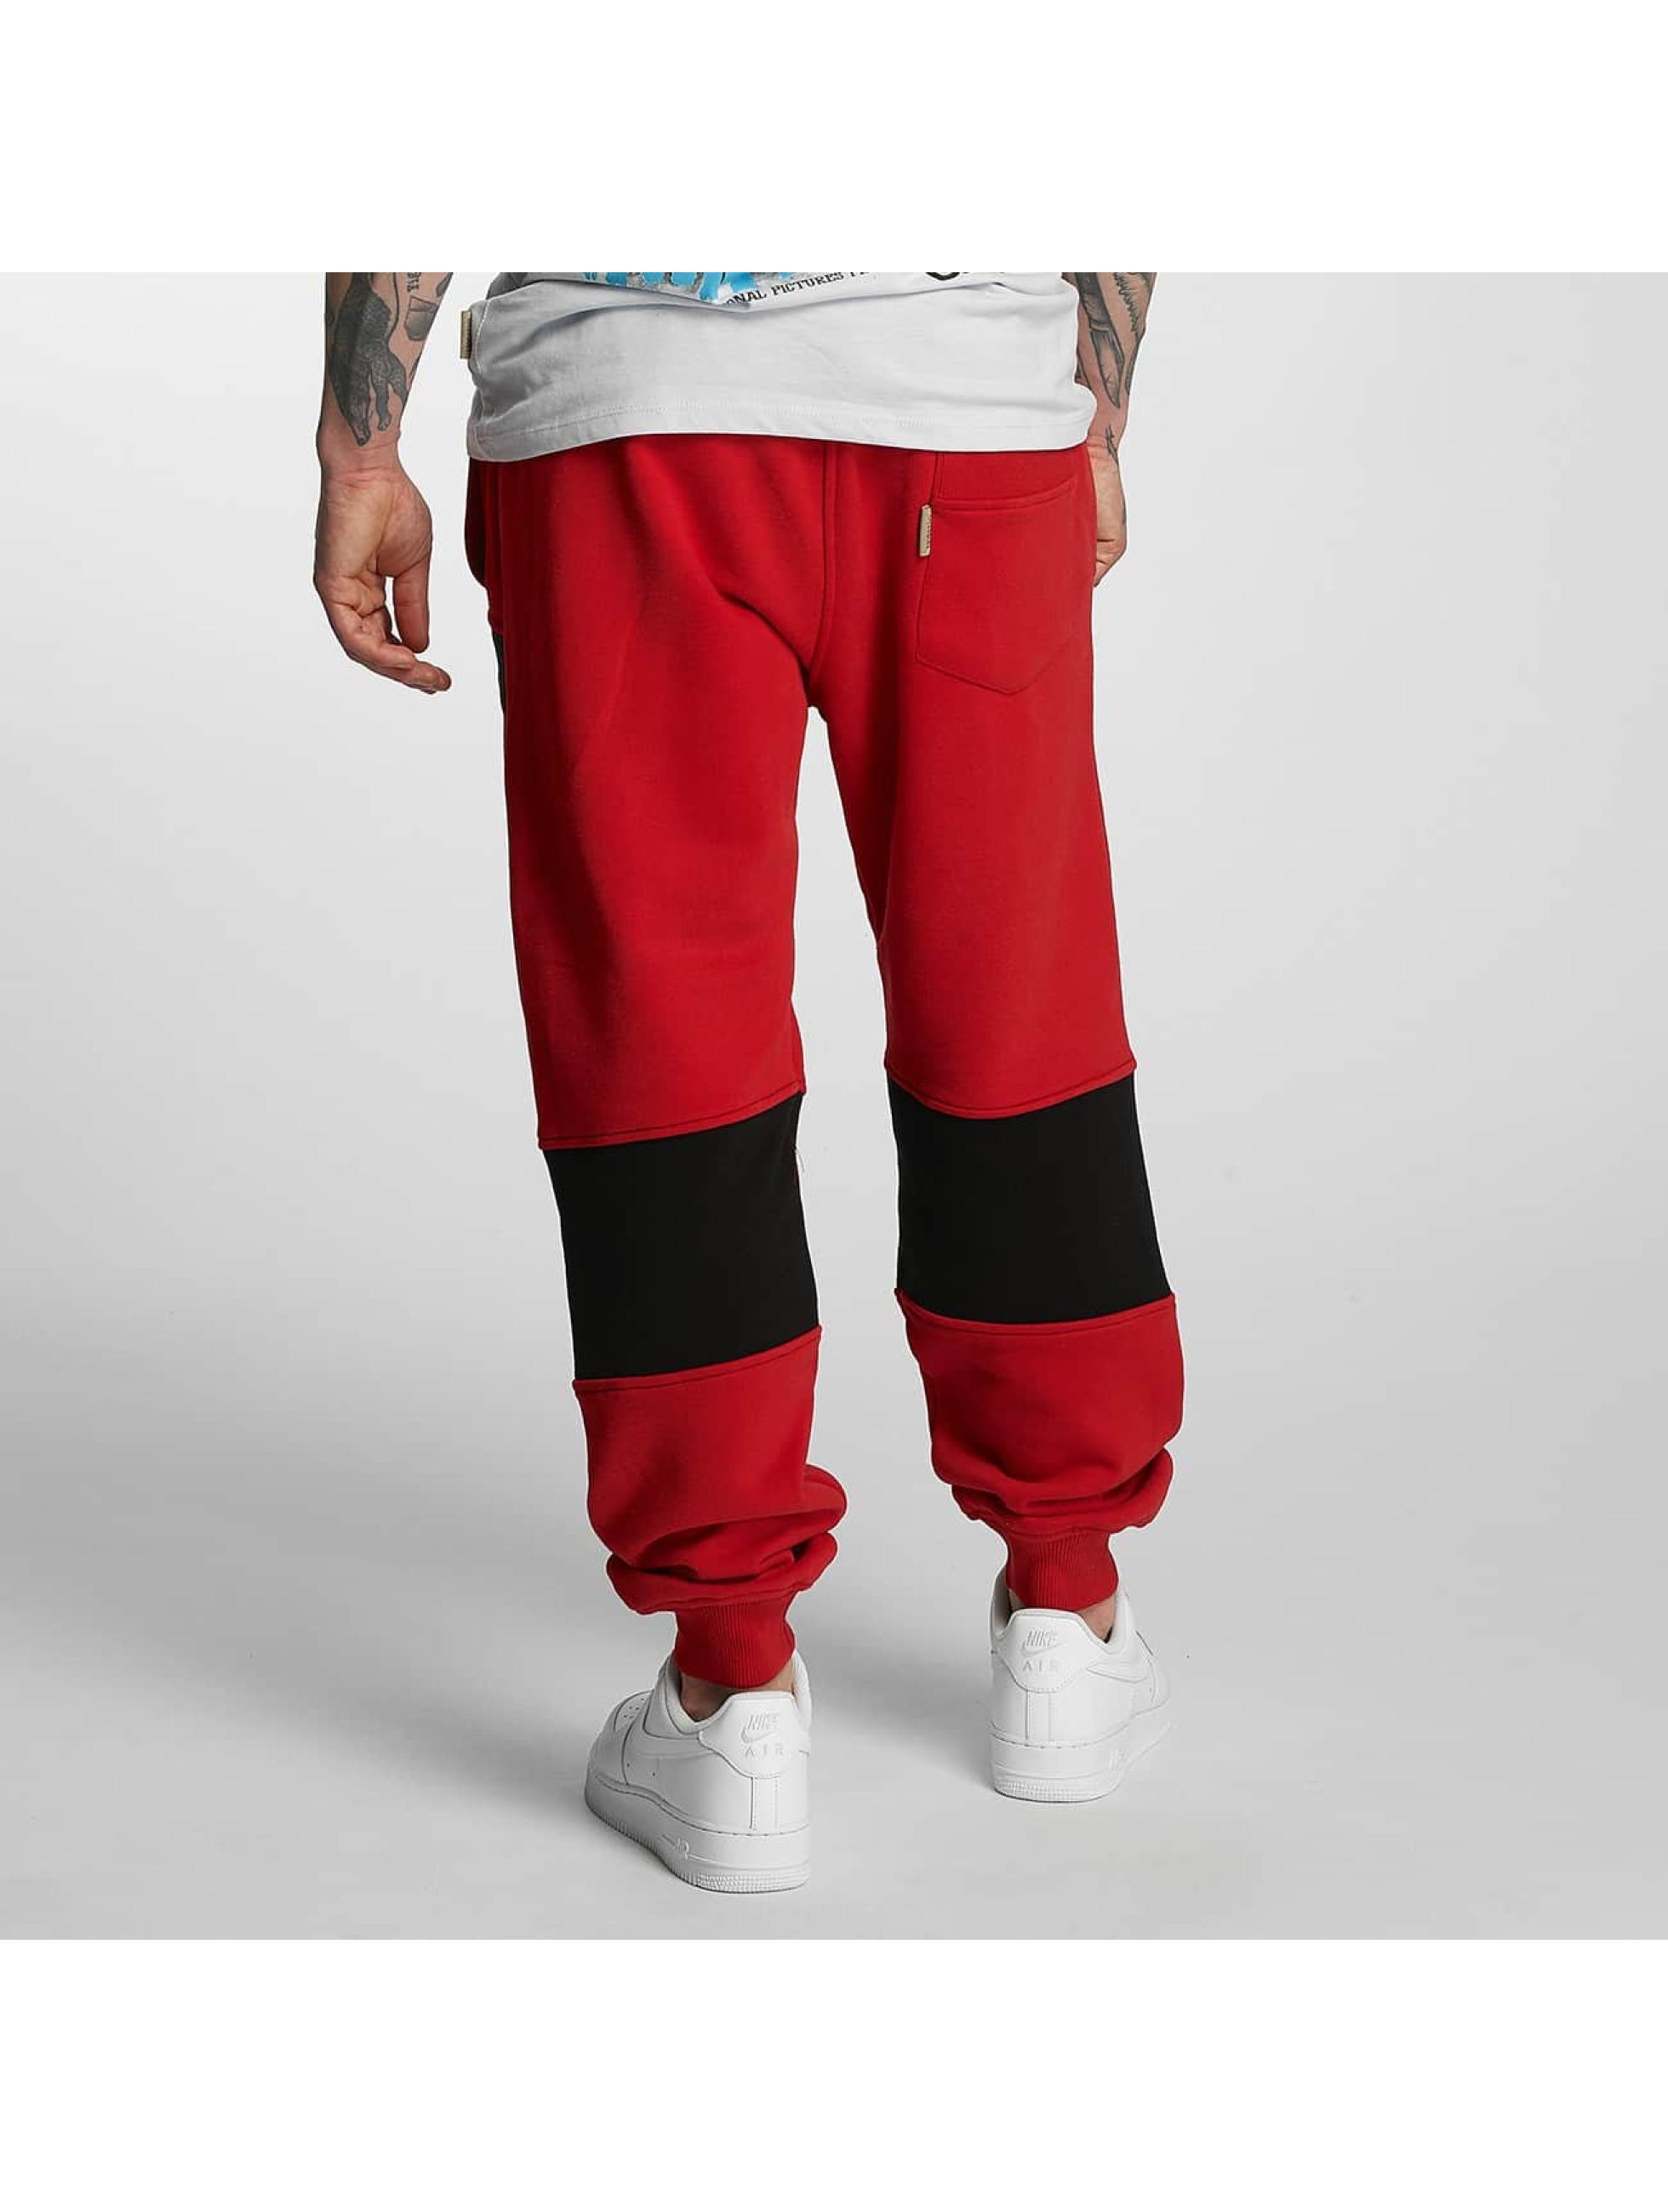 Yakuza Pantalón deportivo Warrior rojo